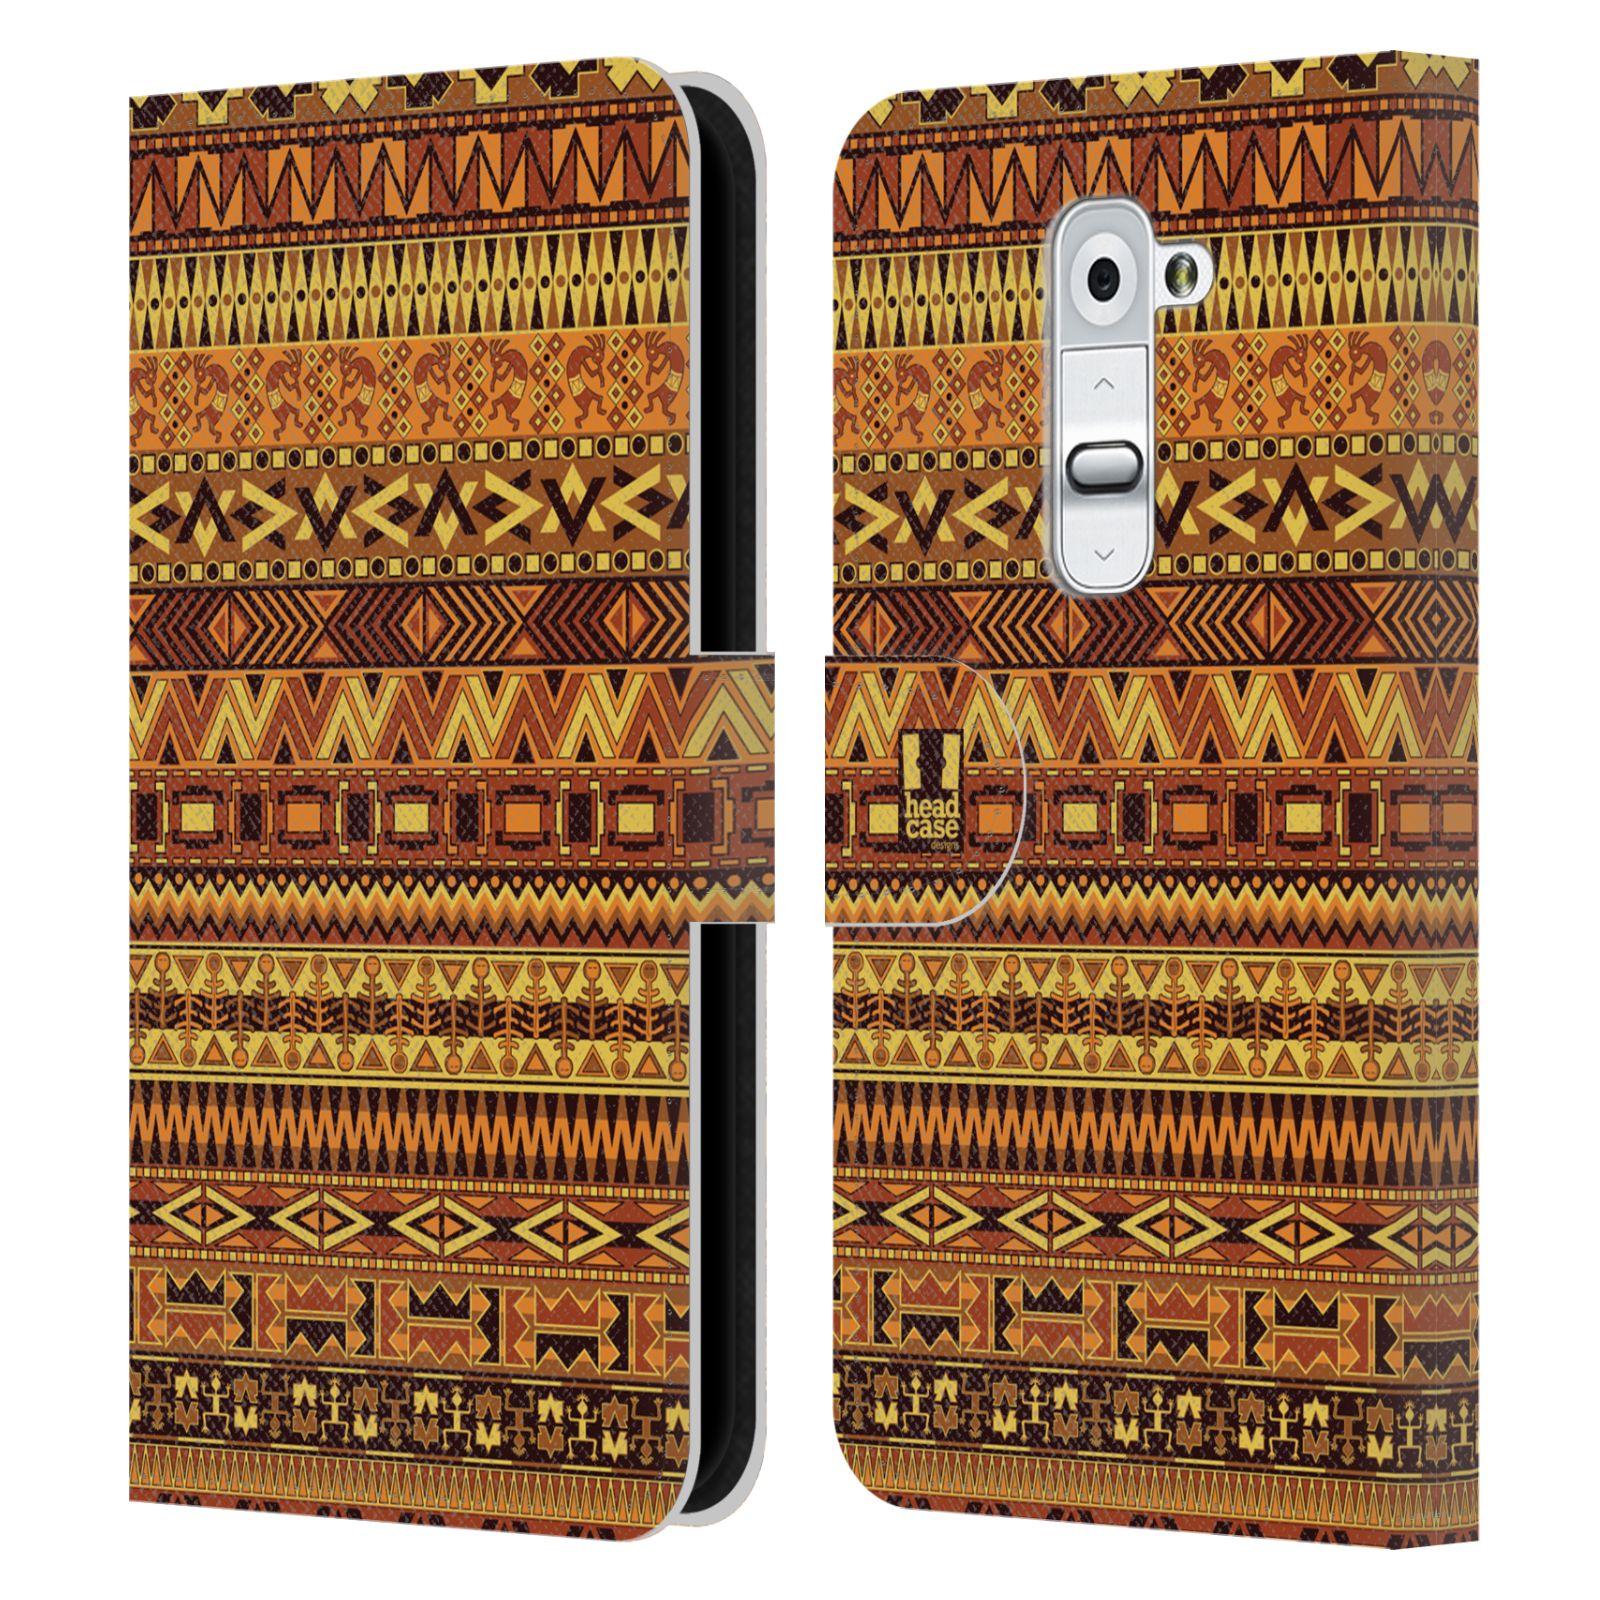 HEAD CASE Flipové pouzdro pro mobil LG G2 (D802) Indiánský vzor YELLOW žlutá